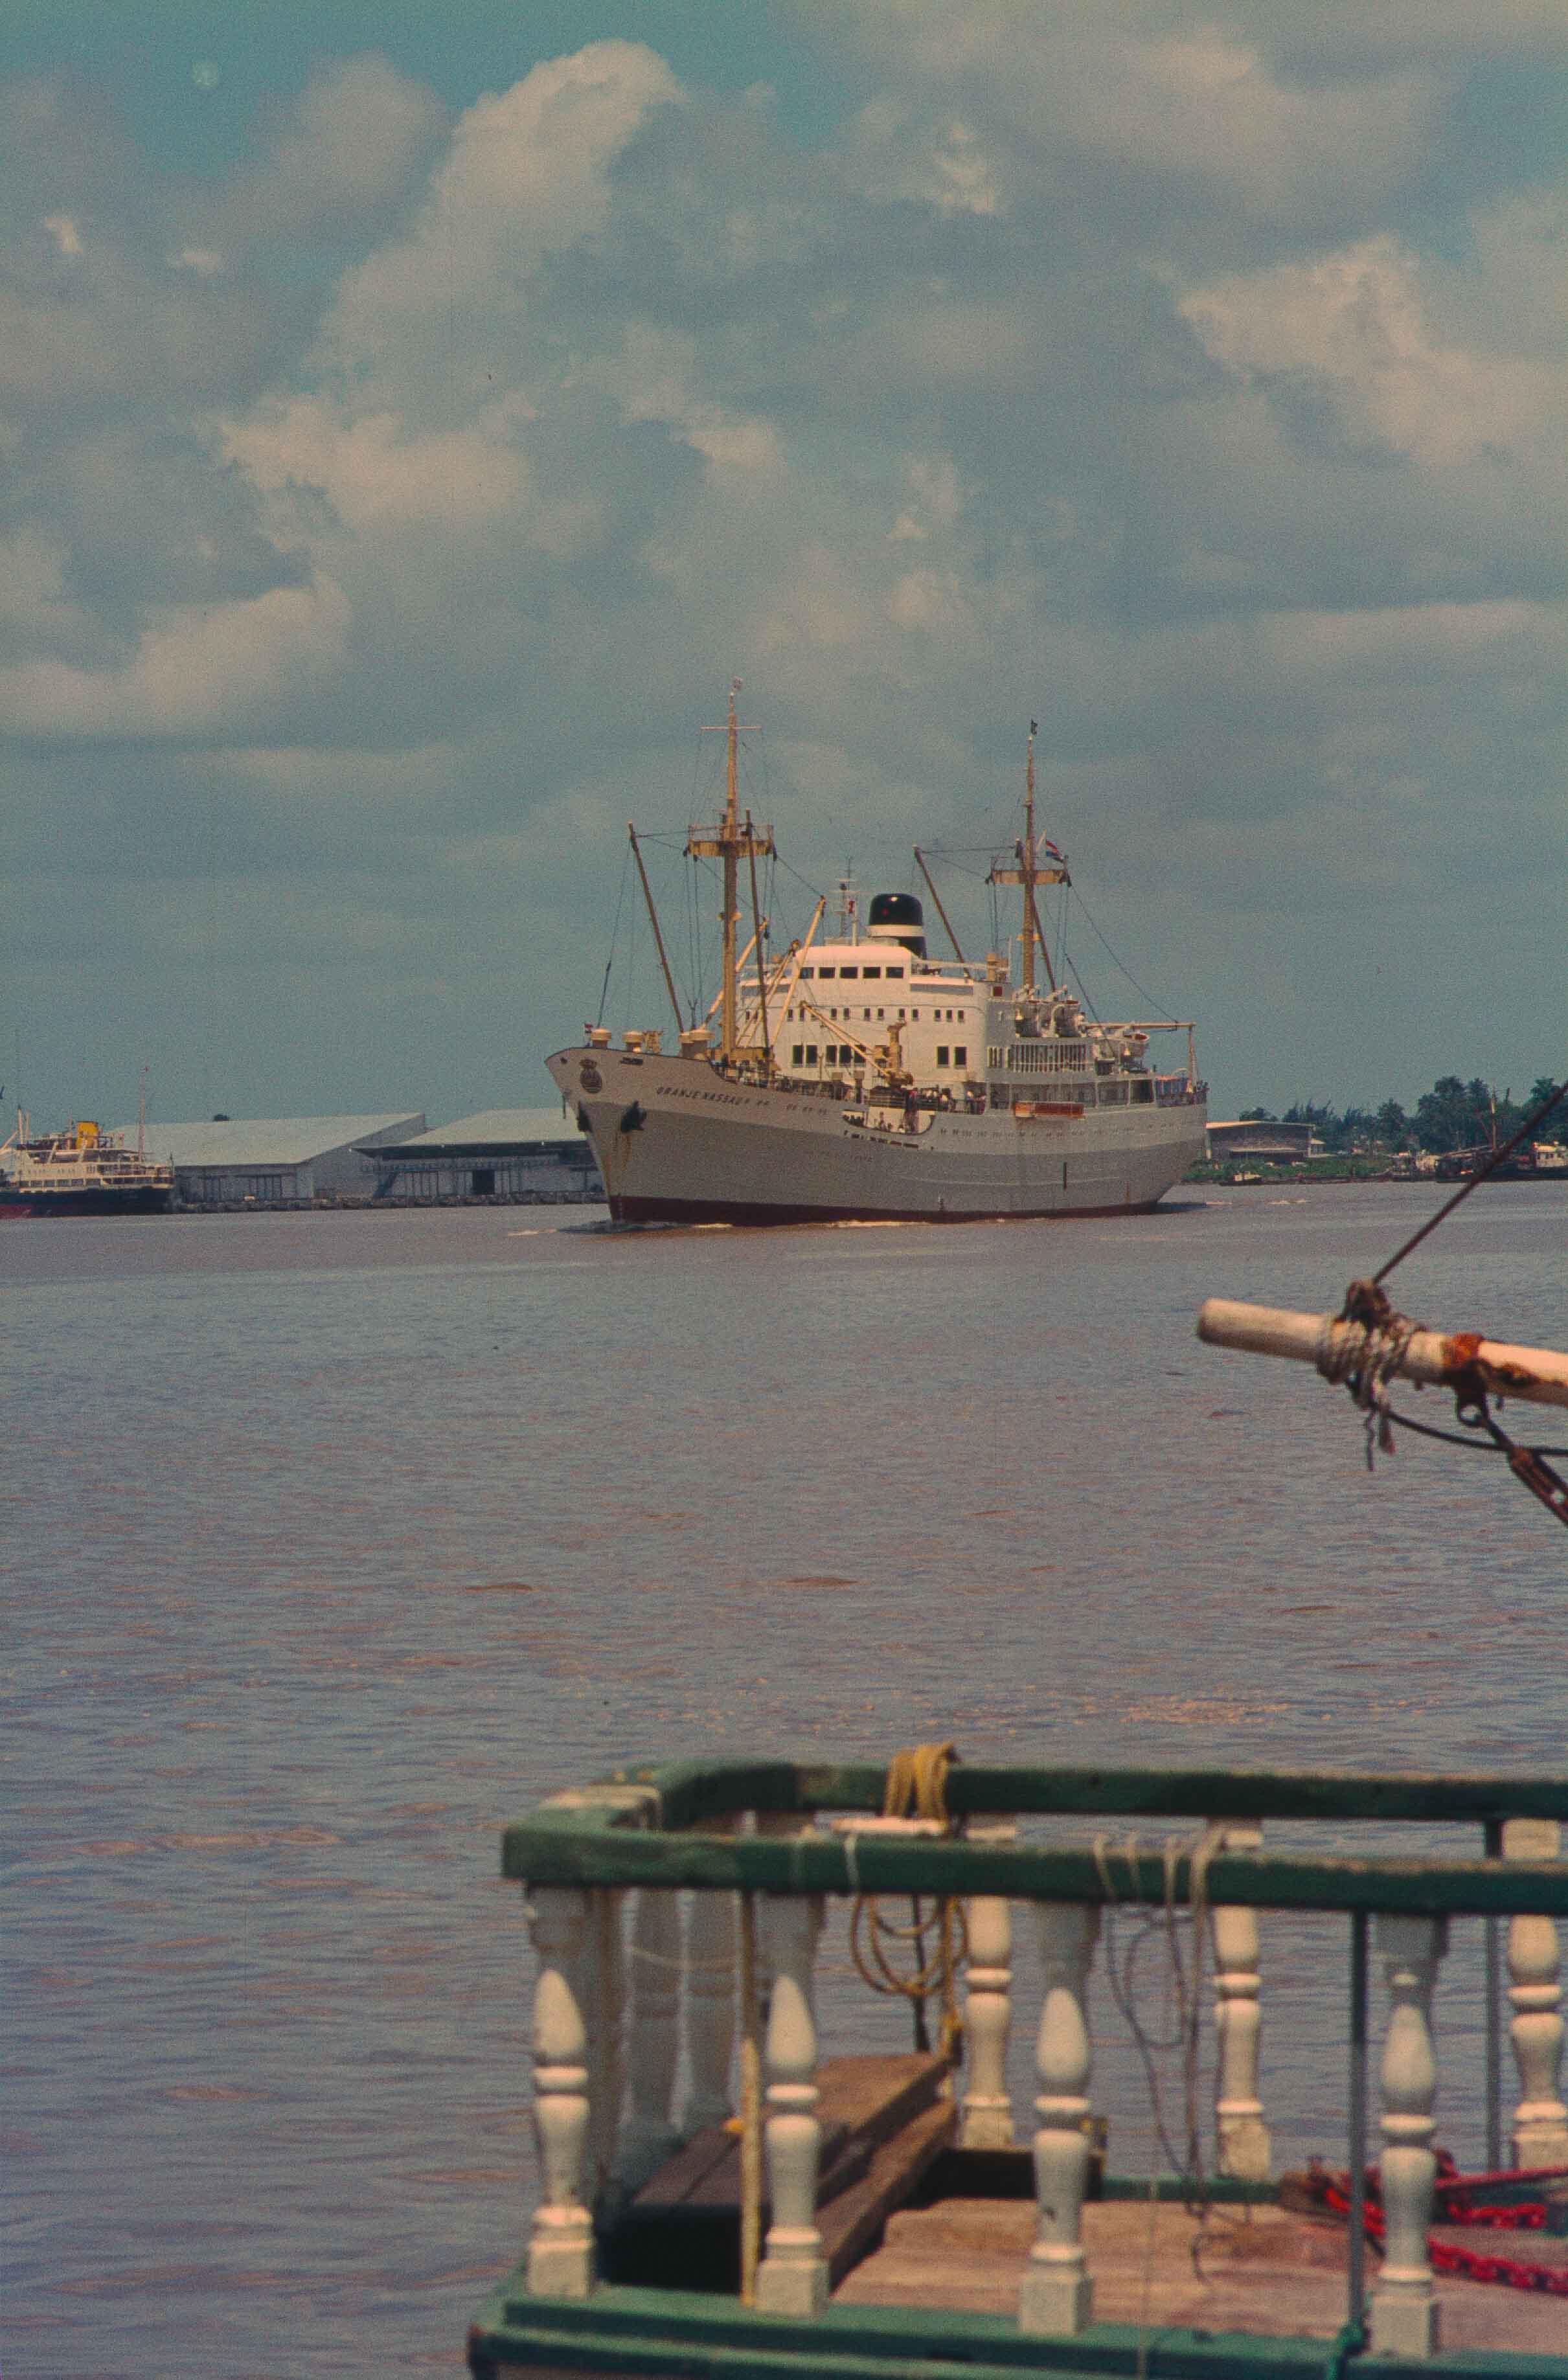 583. Suriname